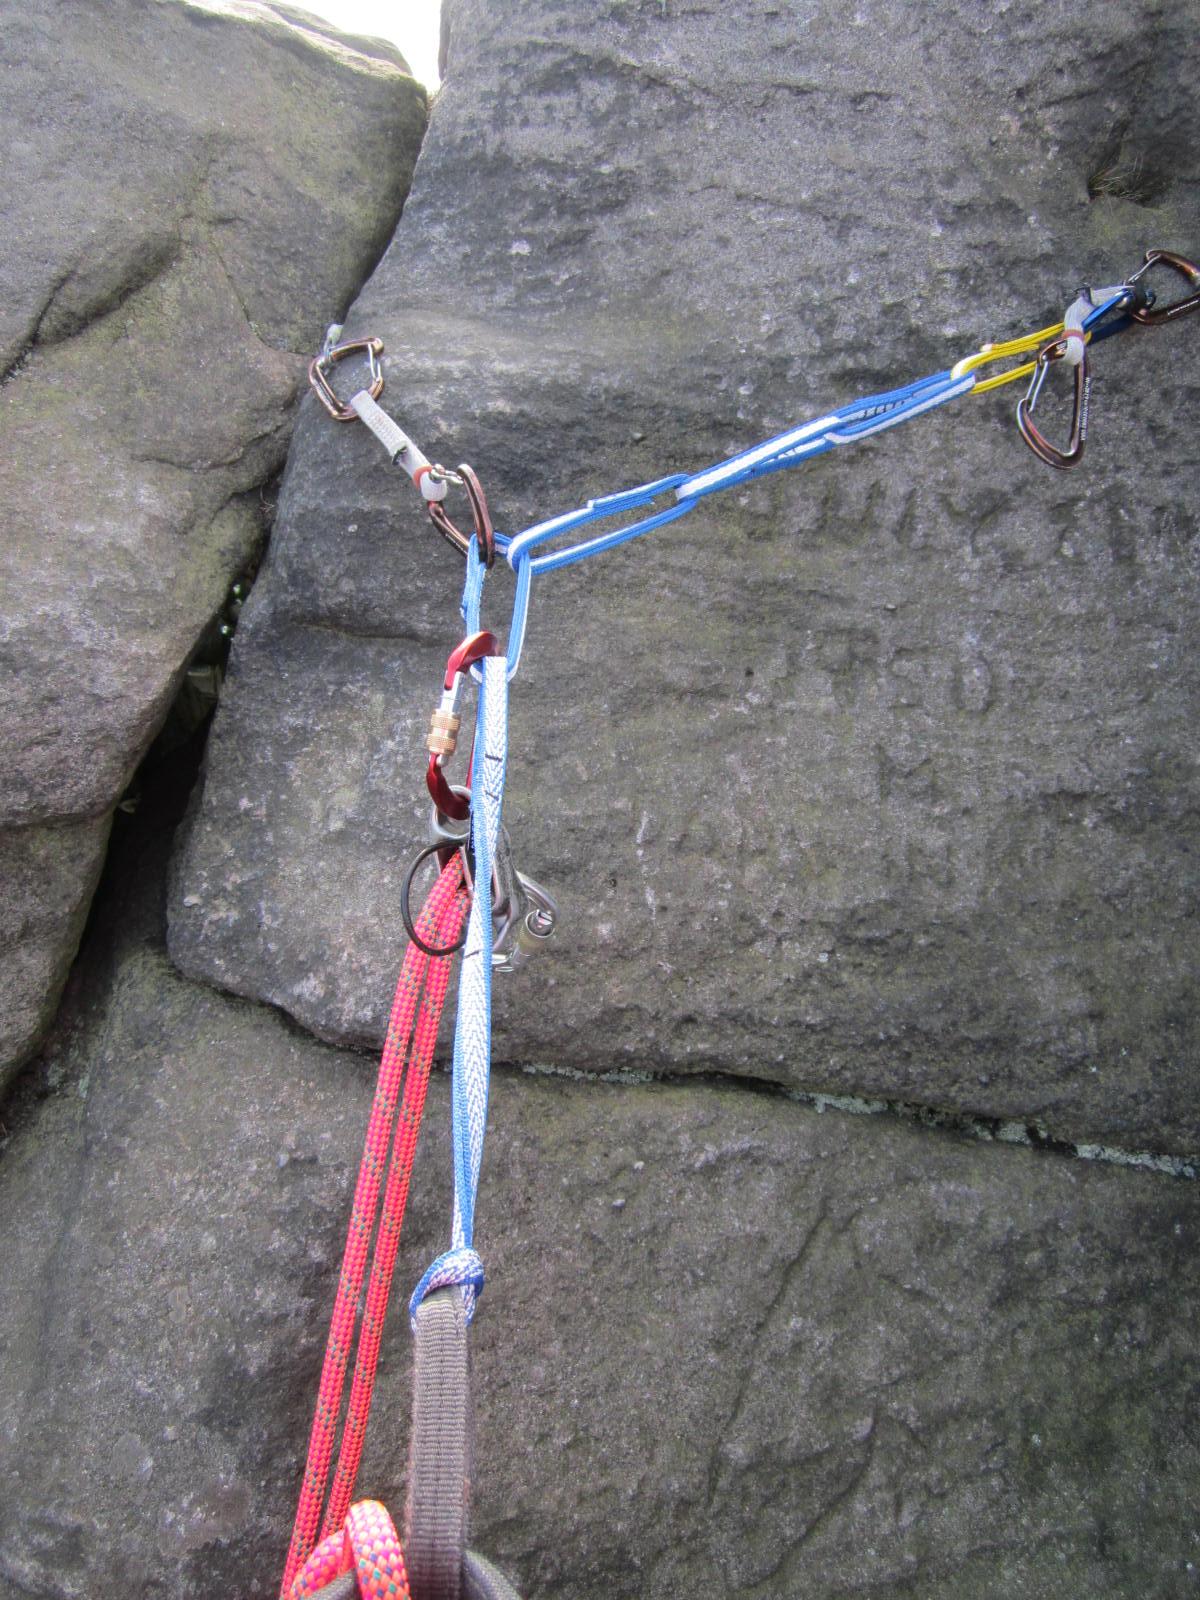 Rock Climbing Anchor Trap Jive Ass Anchors